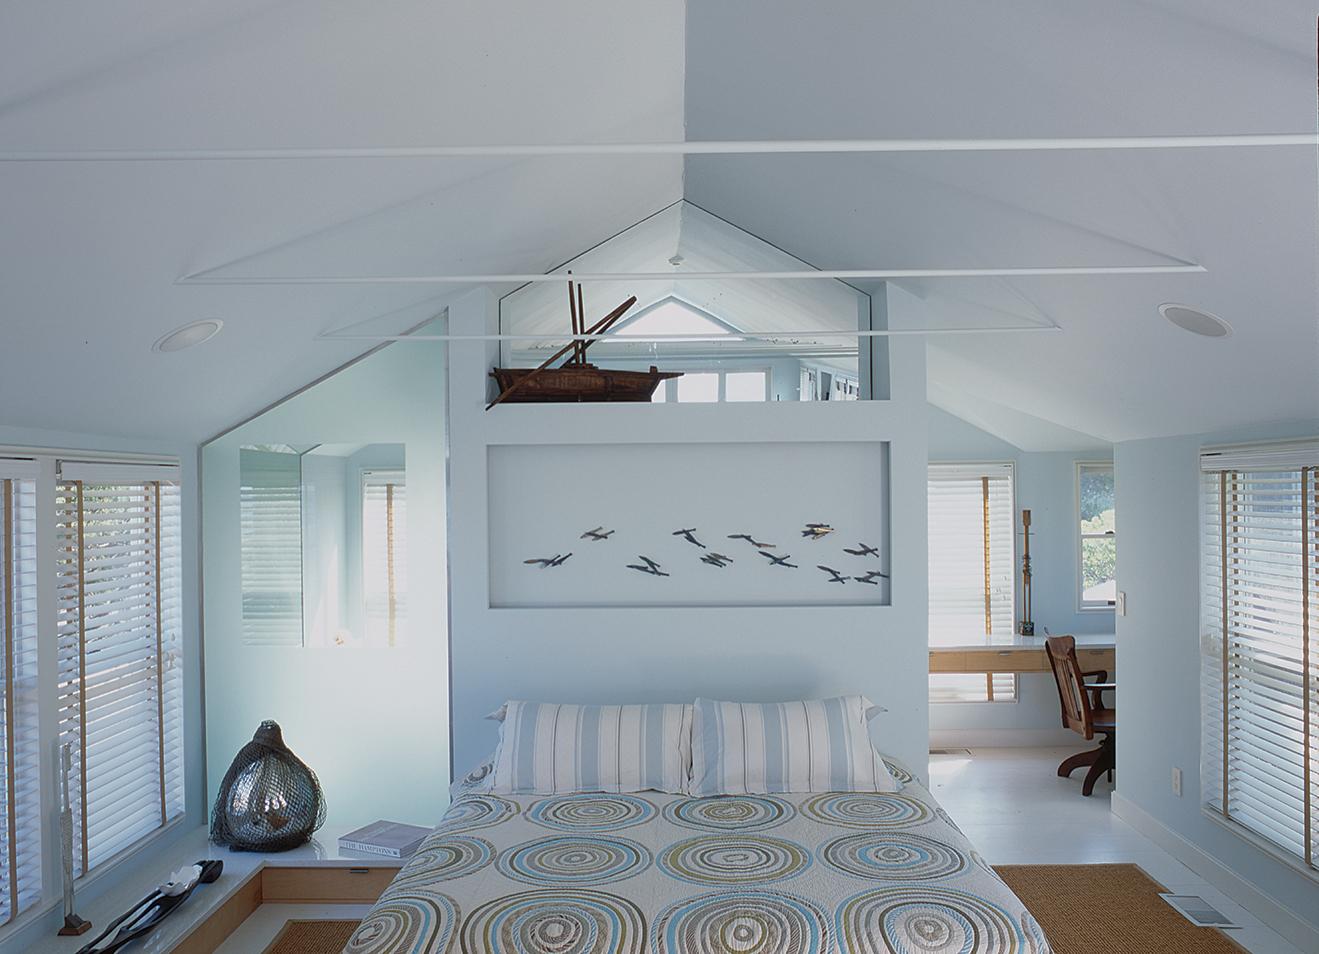 luis-pons-design-interior-house-East-Hampton-NY_9.jpg